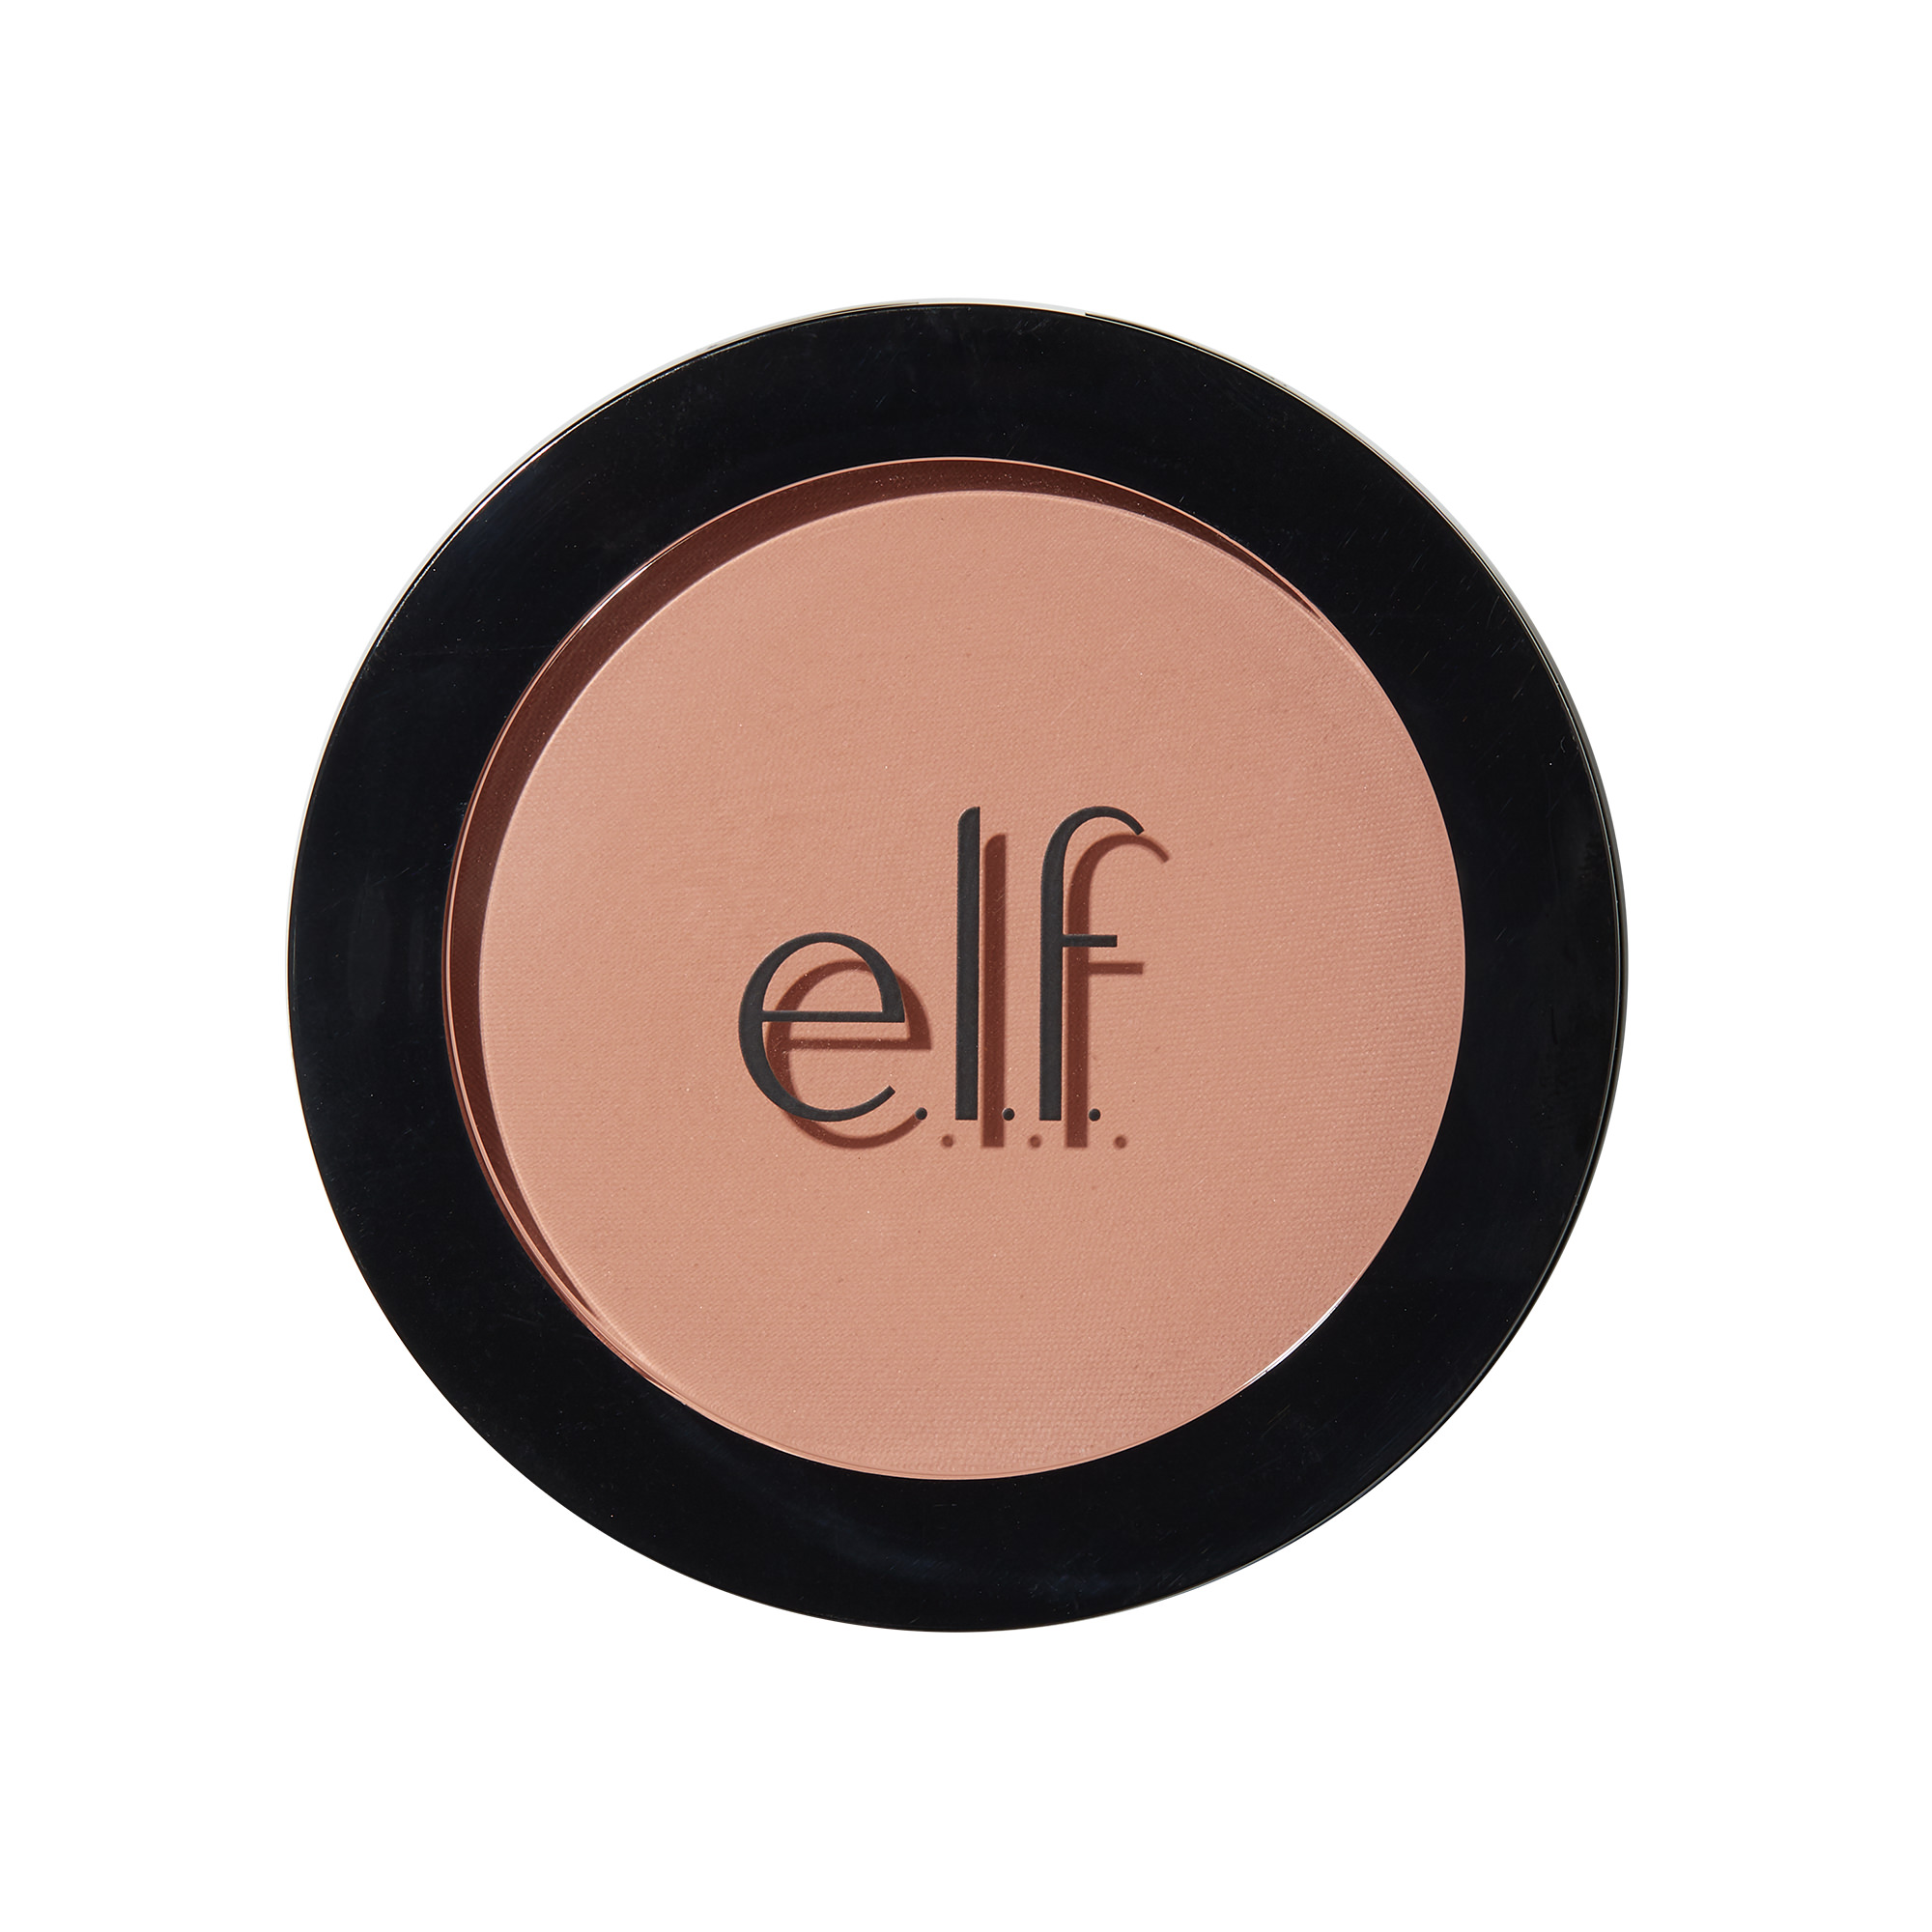 e.l.f. Cosmetics Primer-Infused Blush, Always Rosy